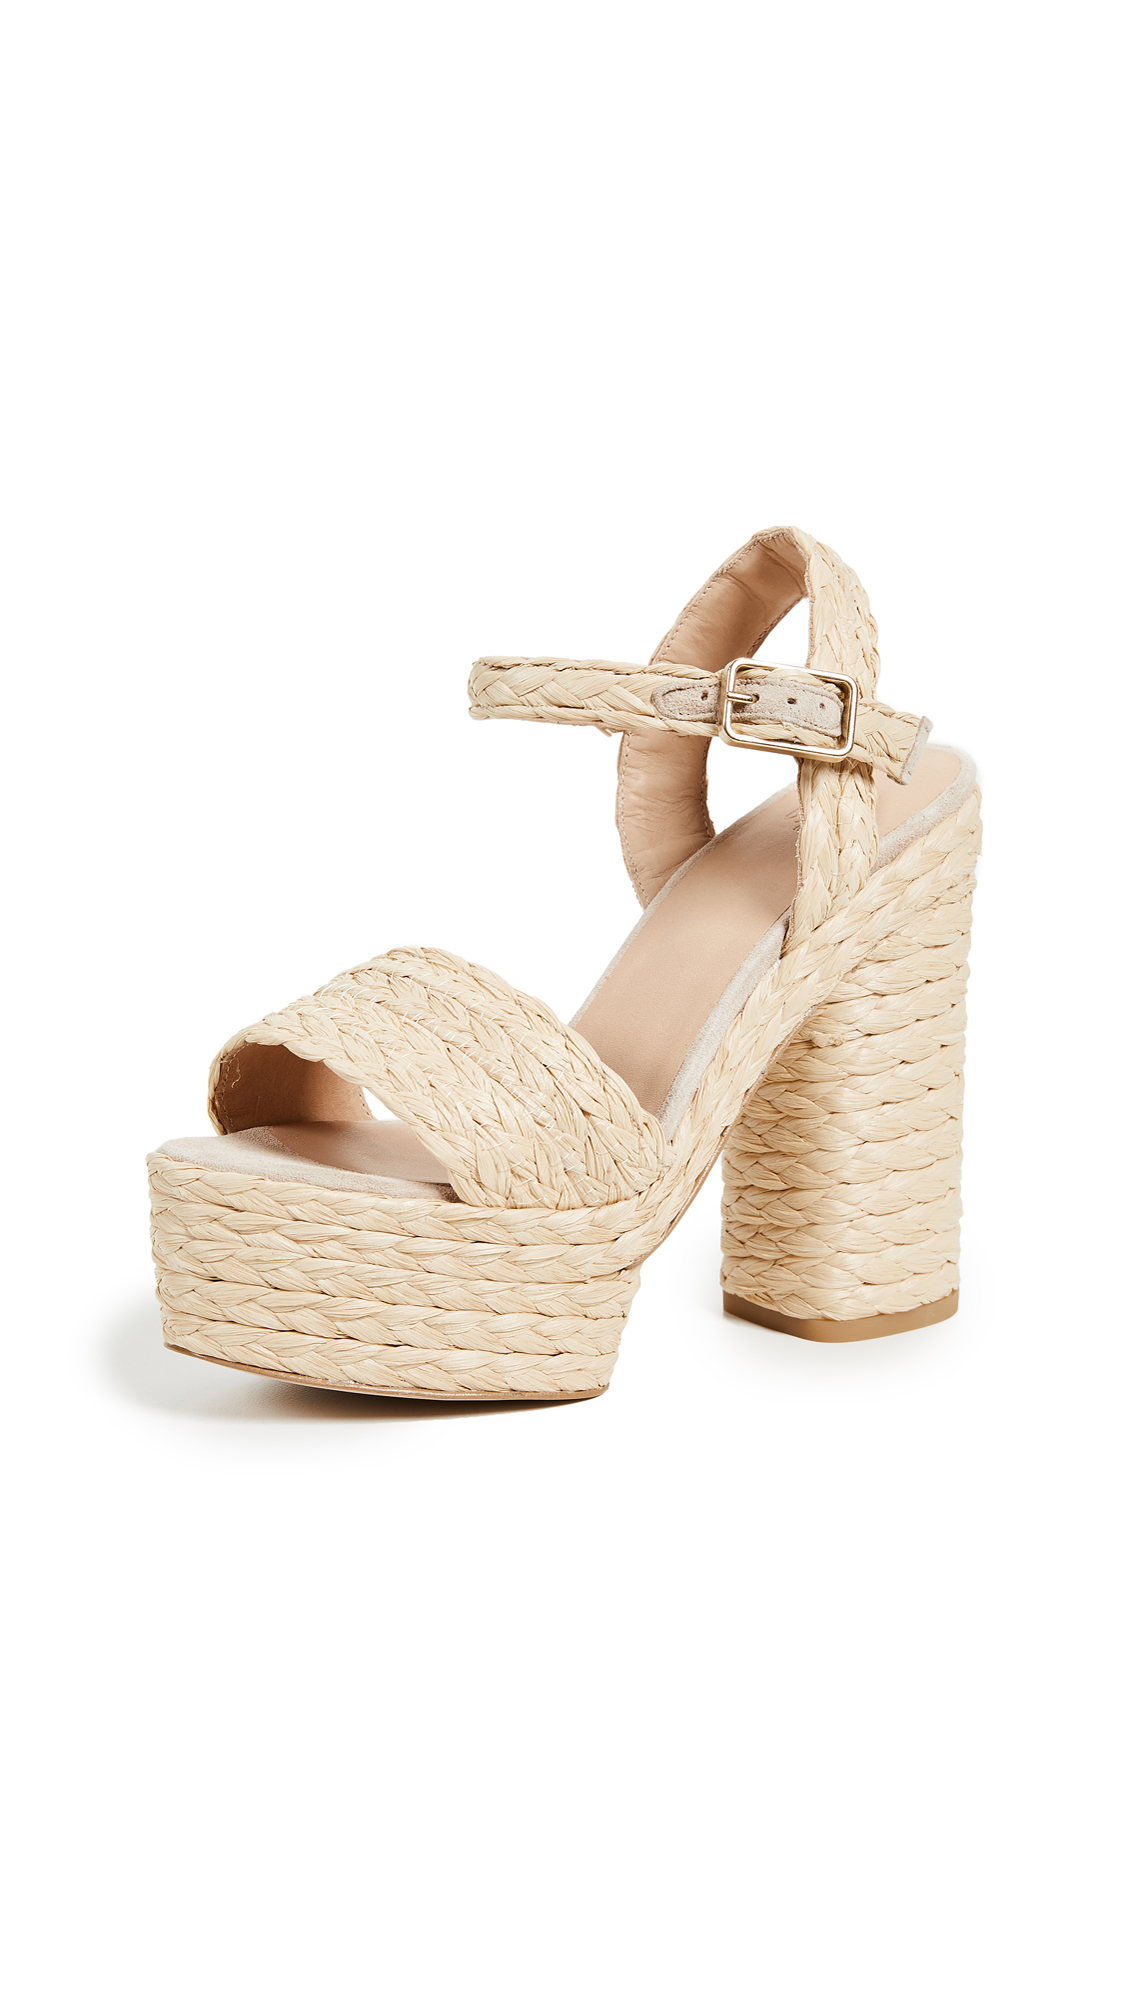 Castaner Abelia Platform Sandals - Beige